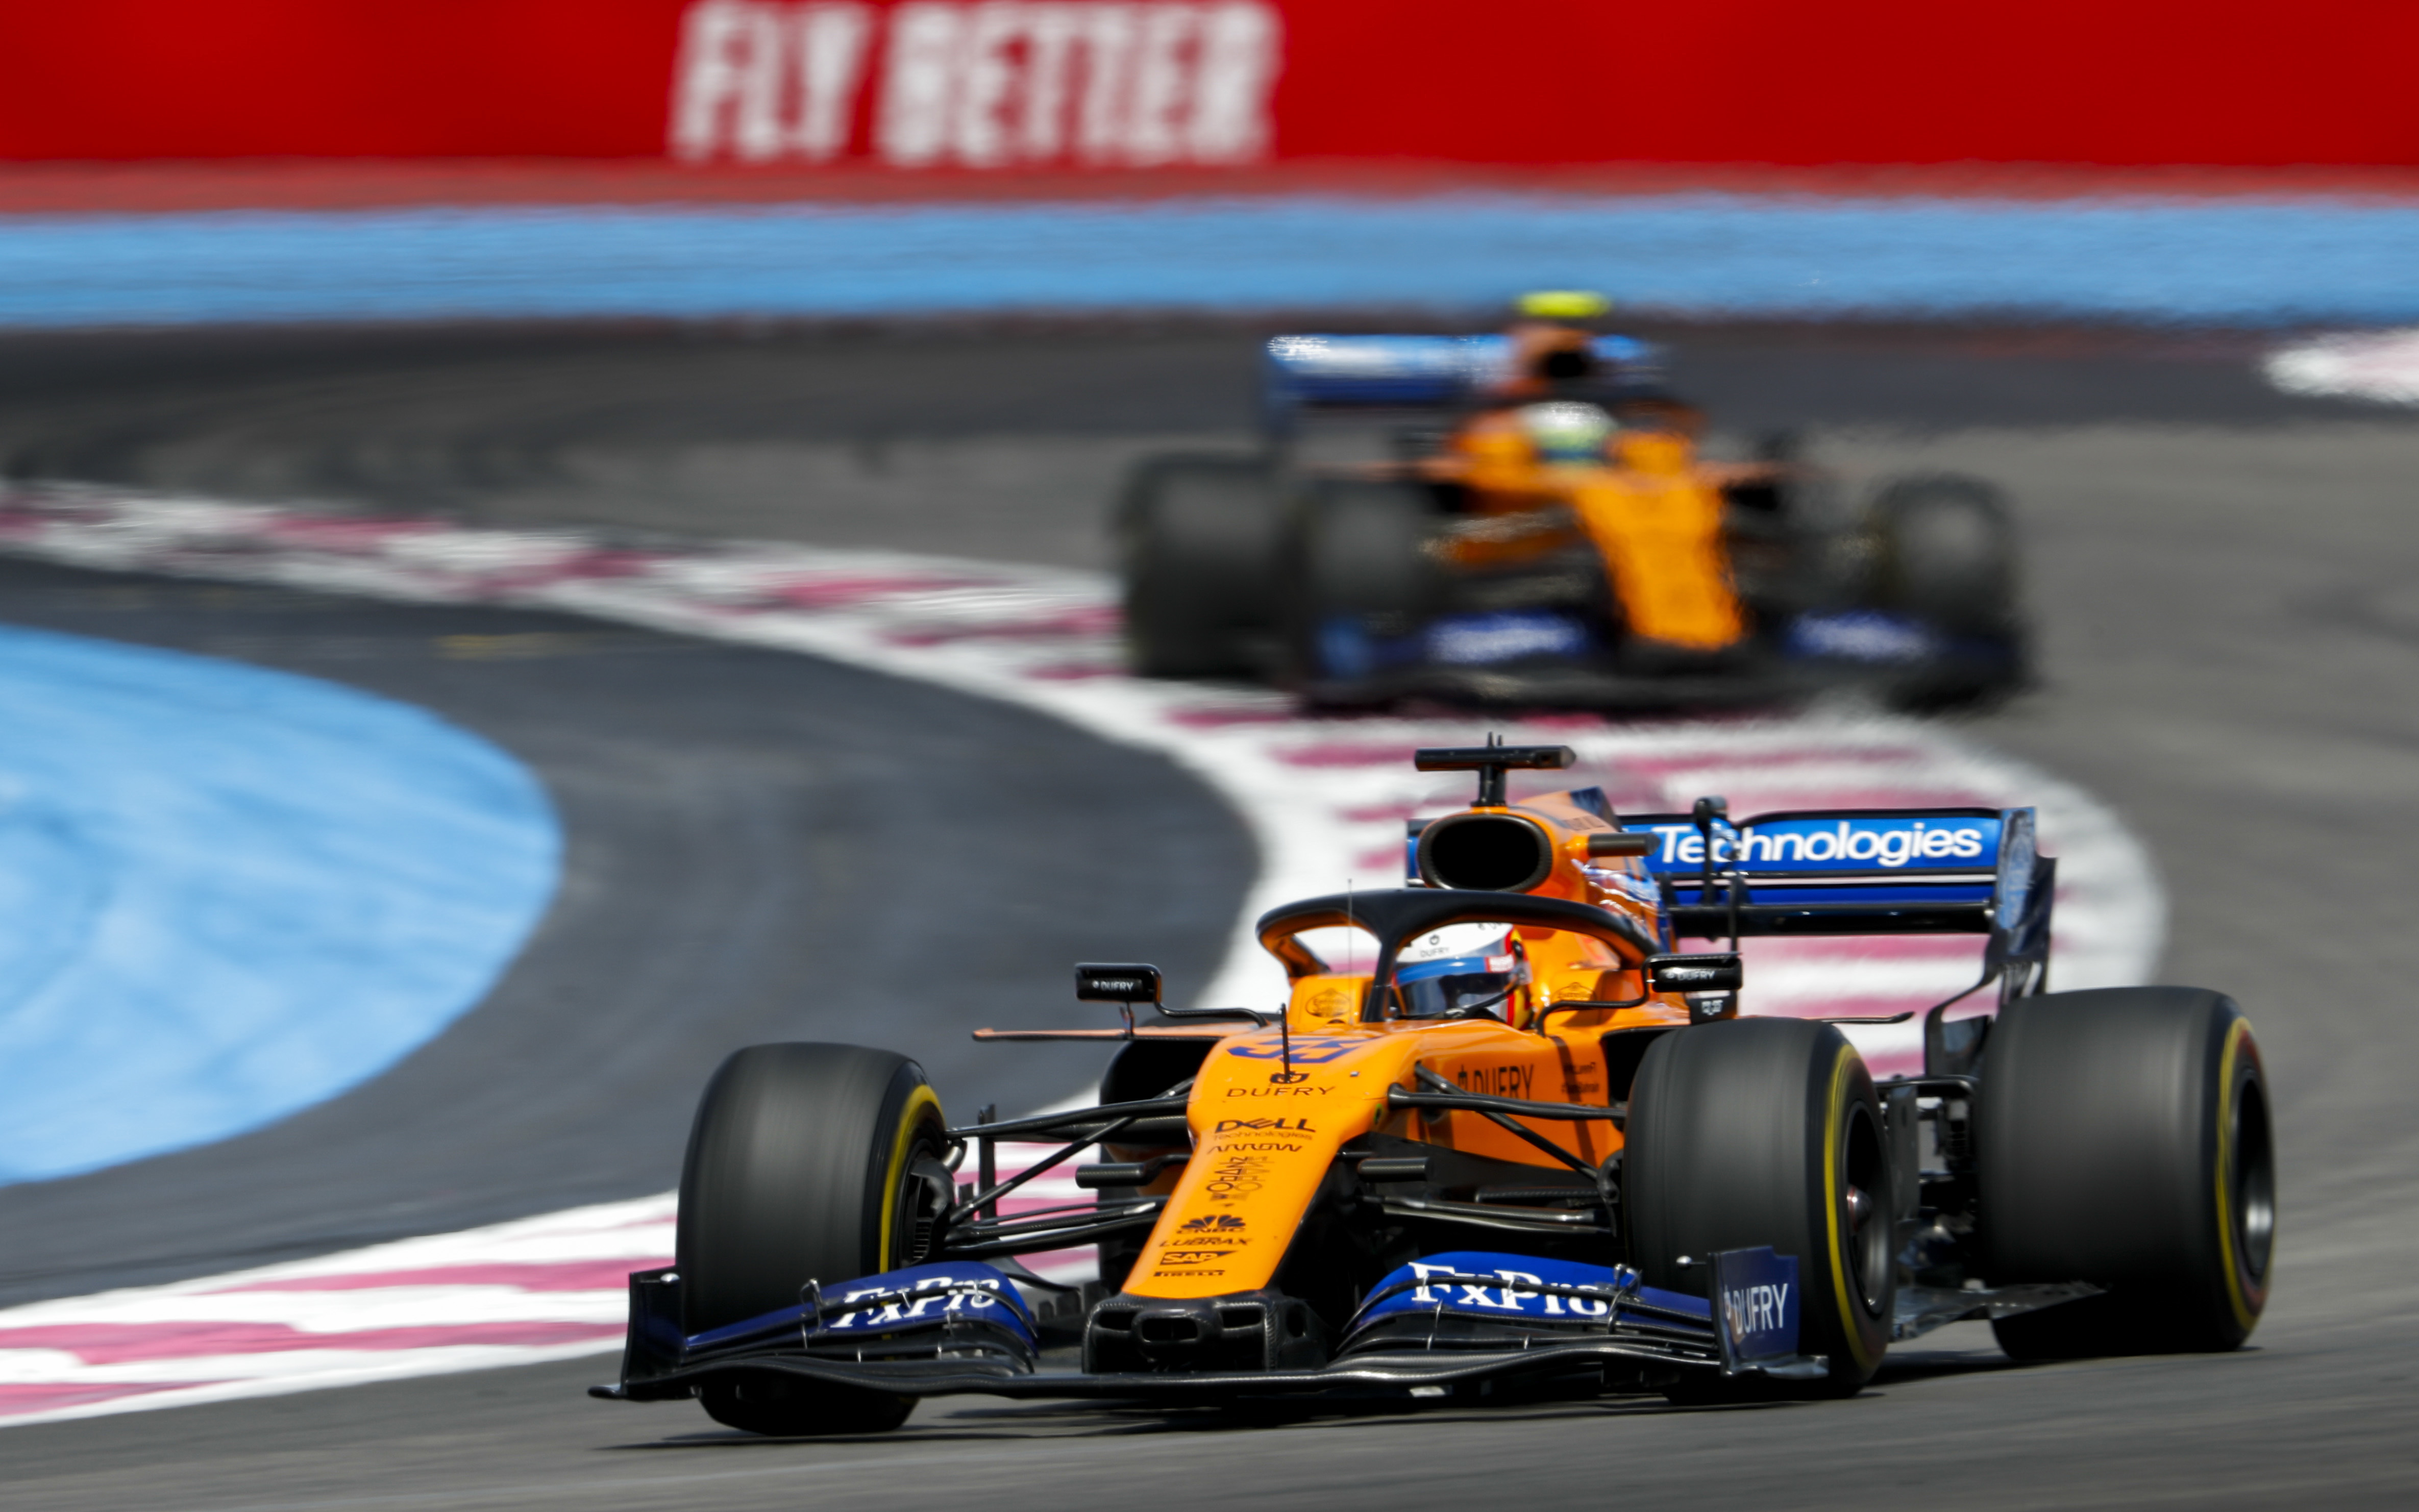 Mclaren Formula 1 2019 Wallpaper 4740x2963